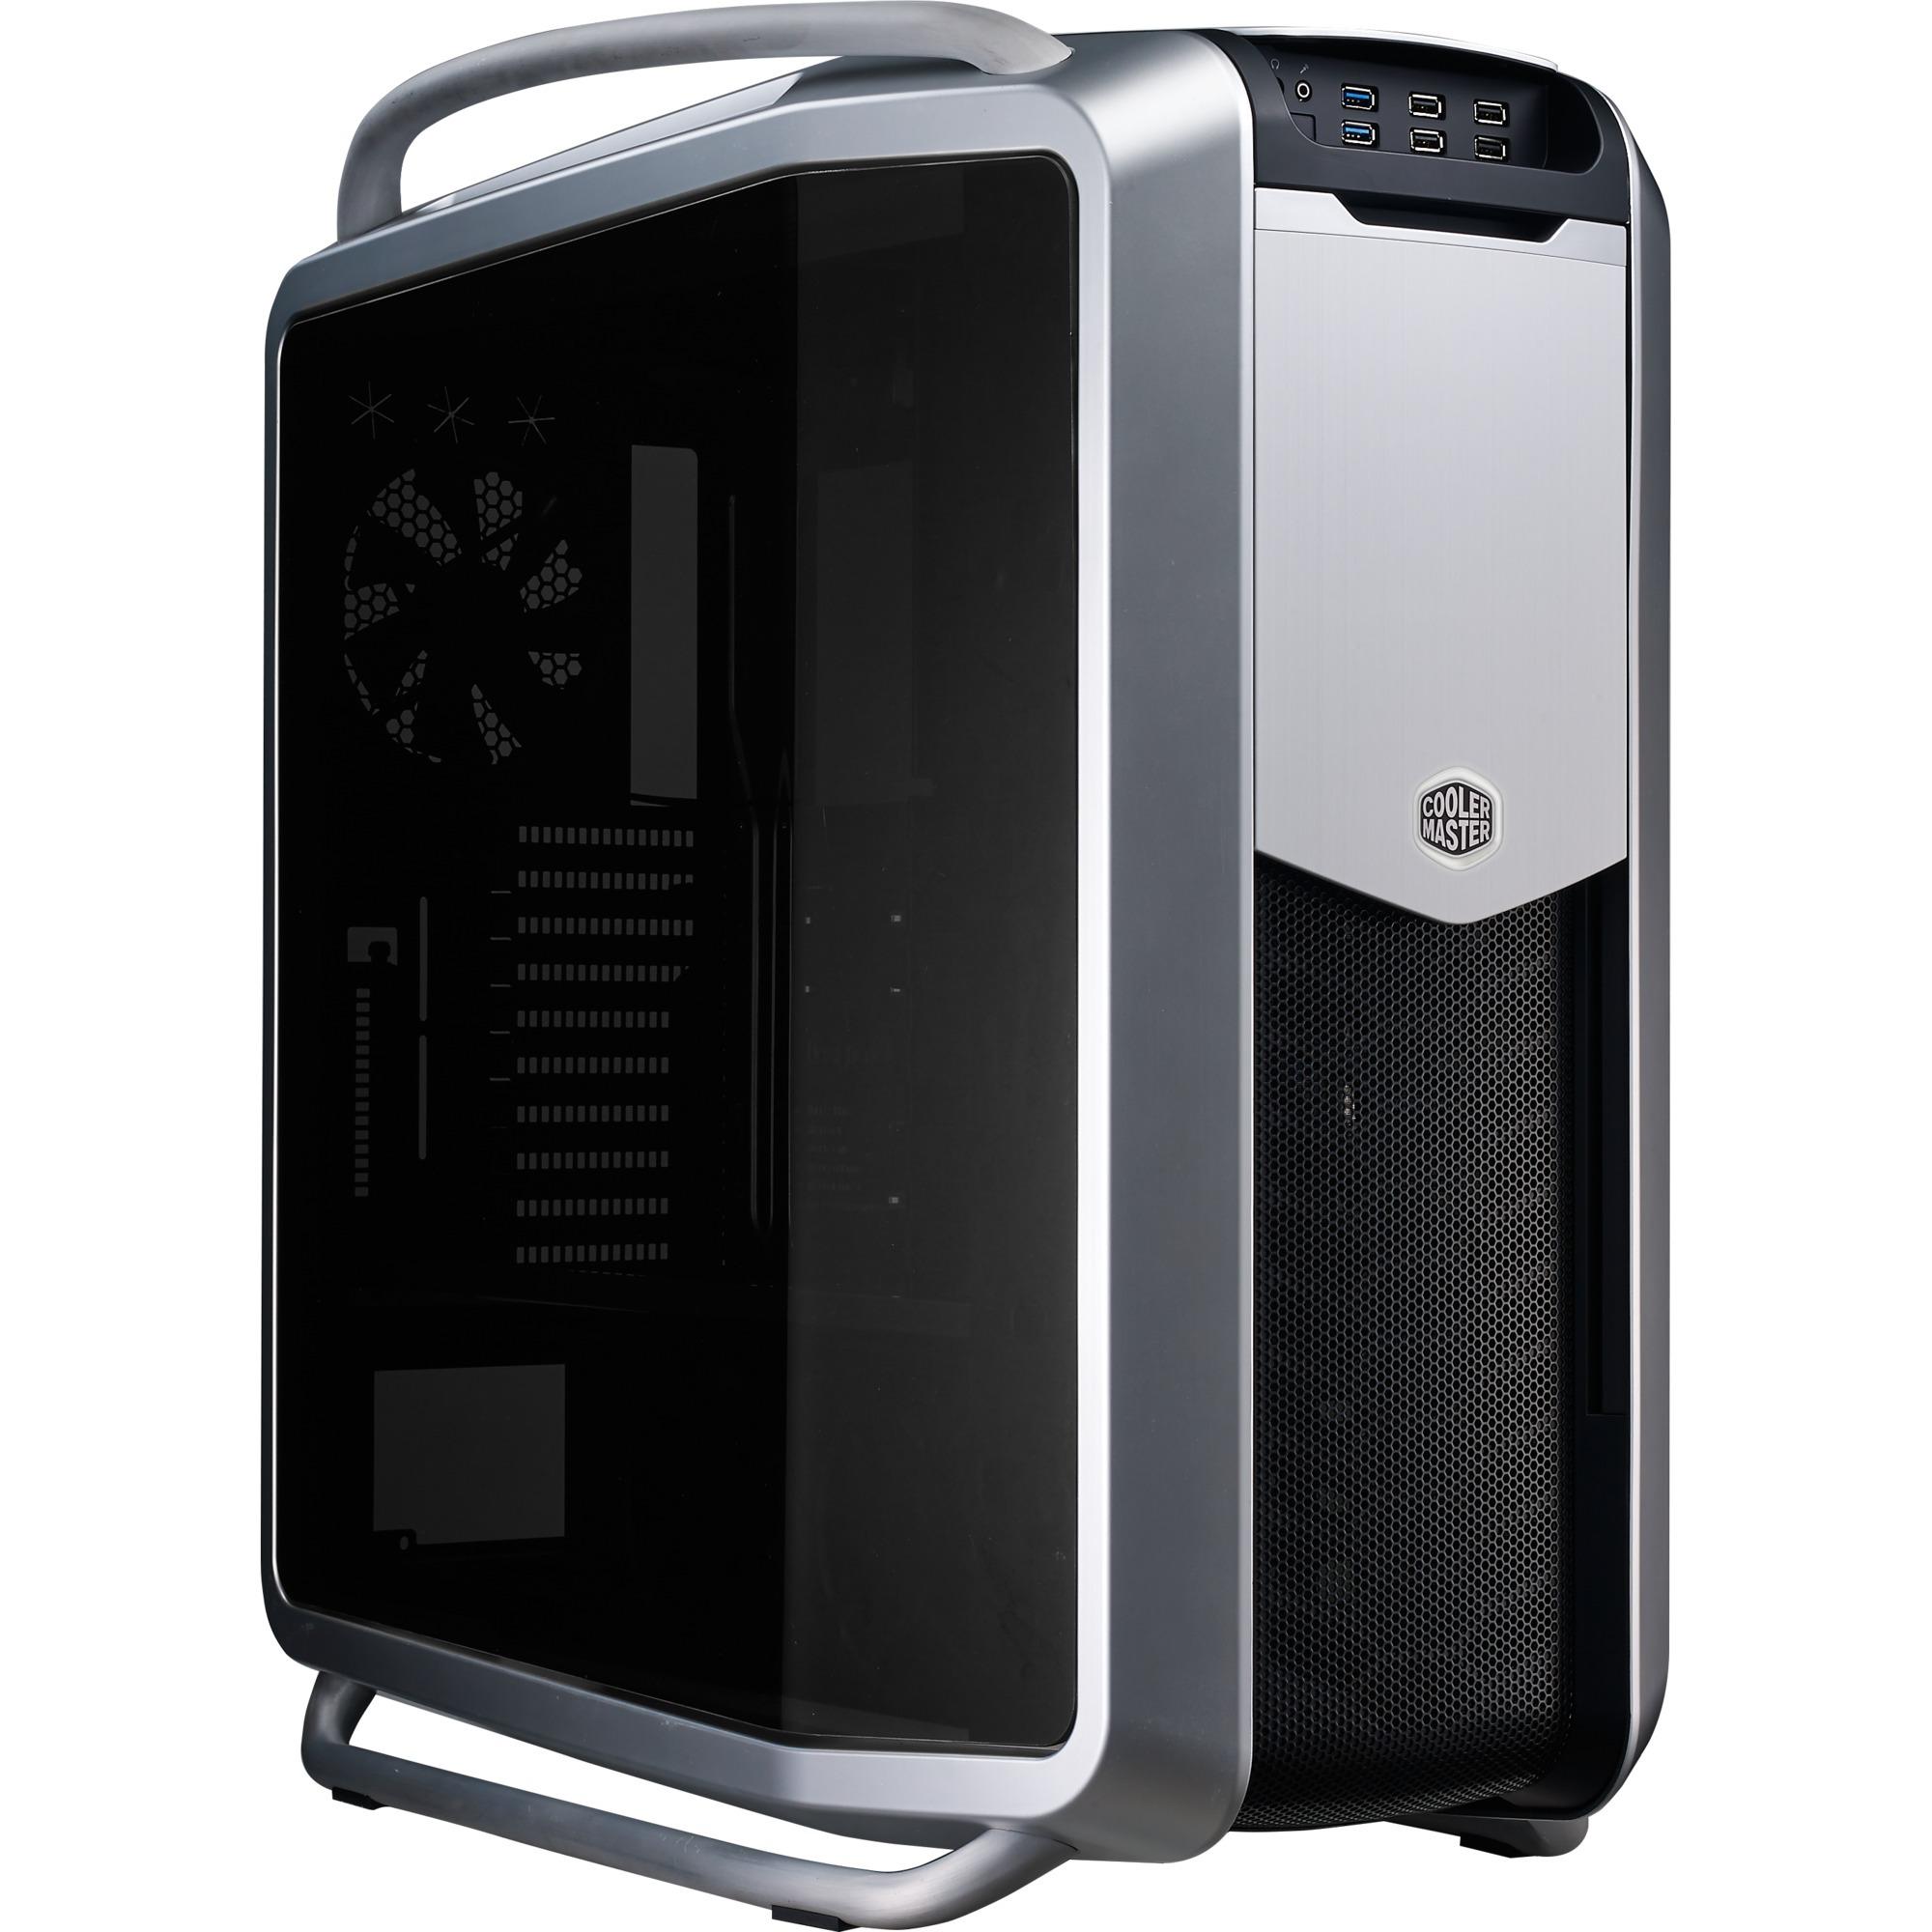 Cosmos II Ultra torre Negro, Plata carcasa de ordenador, Caja de torre grande